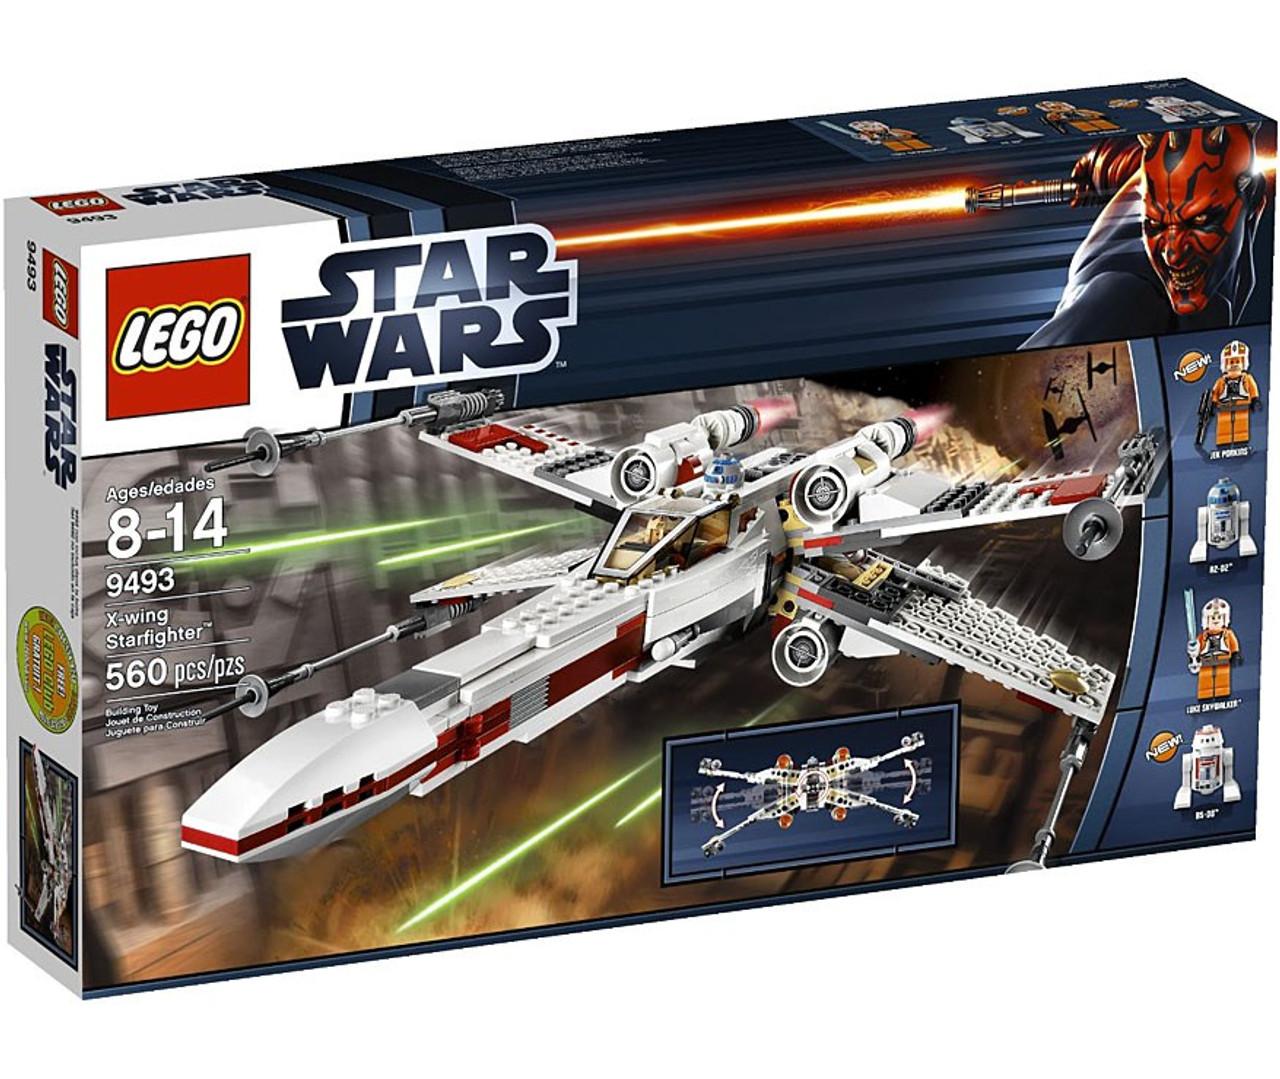 Lego Star Wars X Wing Starfighter 75218 Brand New: LEGO Star Wars A New Hope X-Wing Starfighter Set 9493